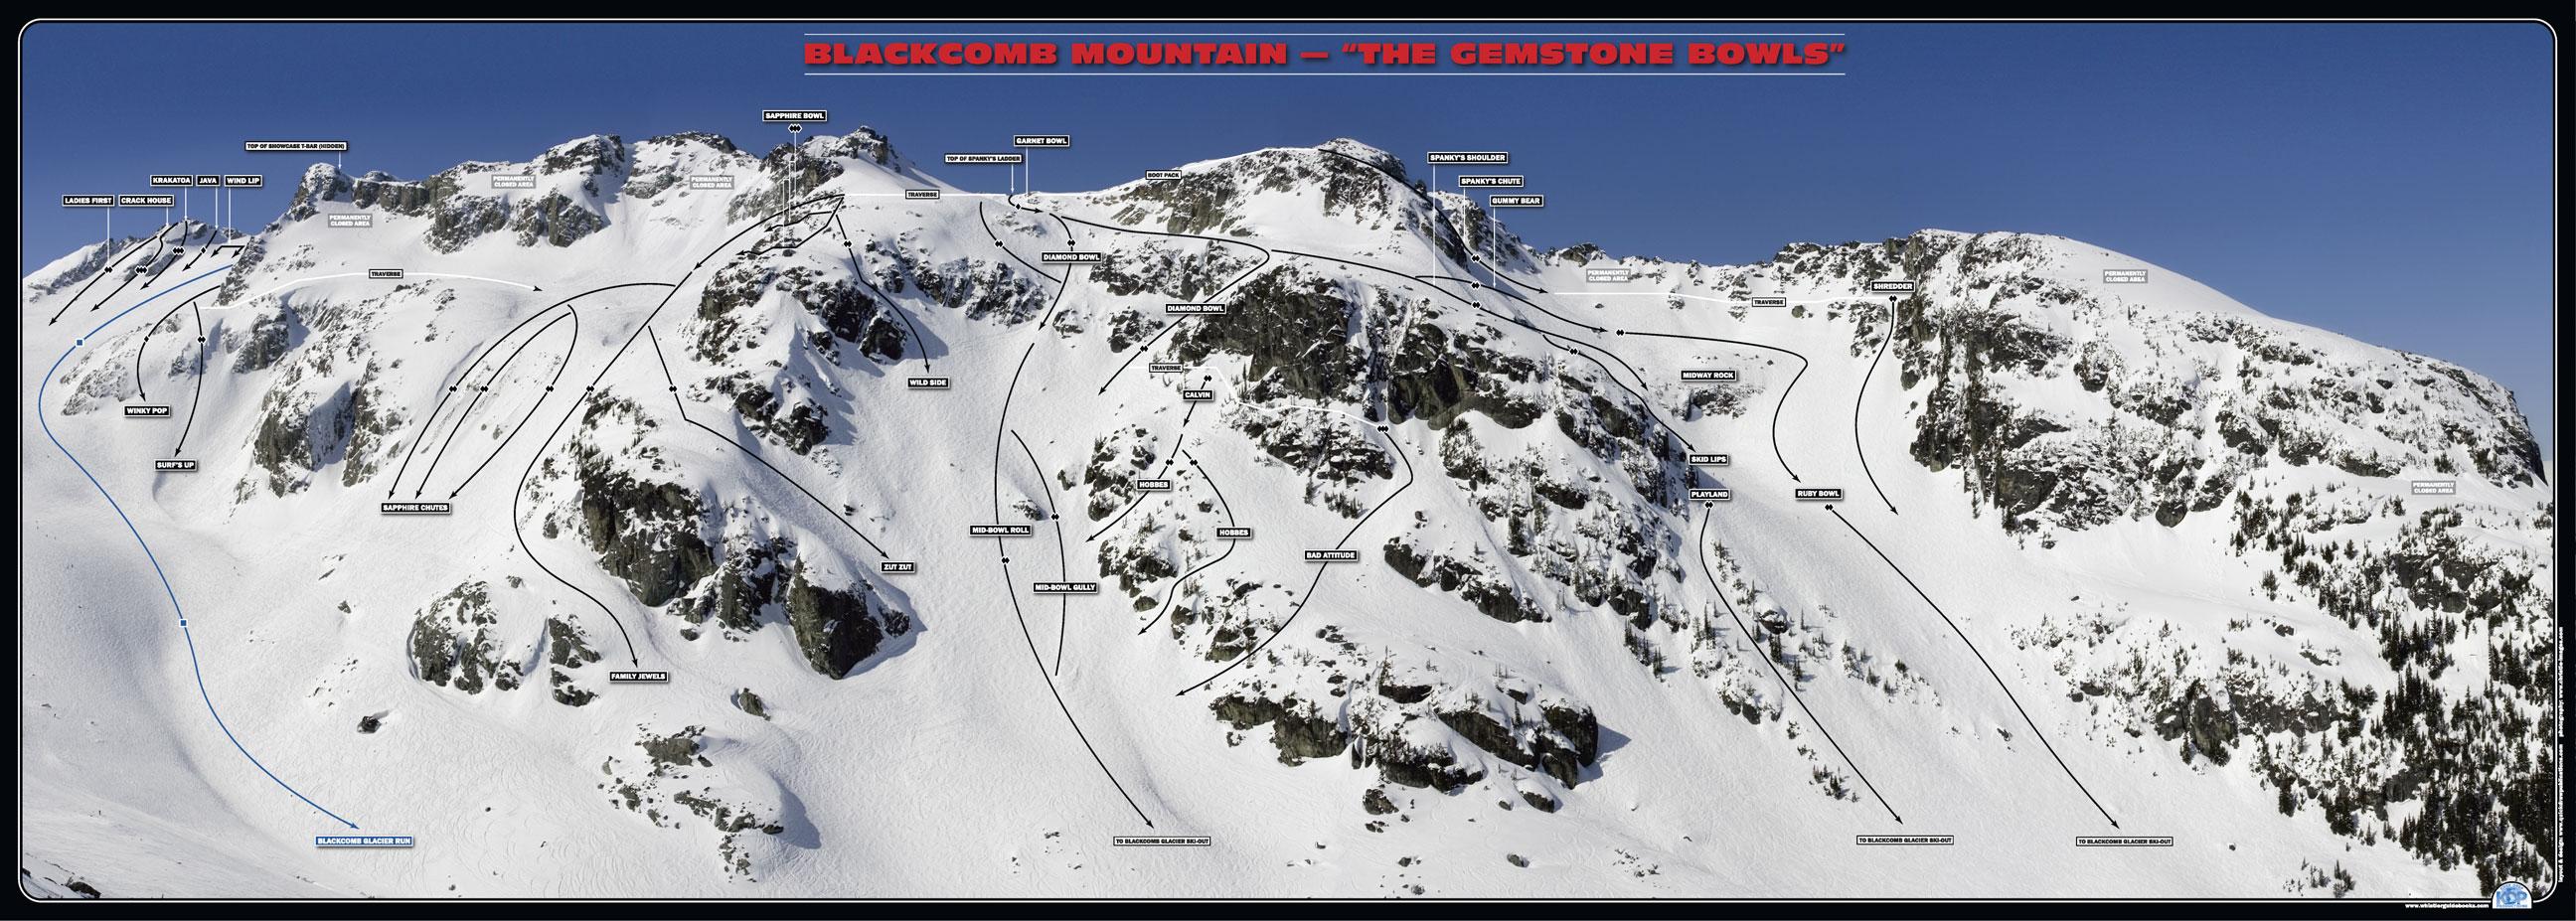 blackcomb glacier - my favorite spot for riding powder in Whistler